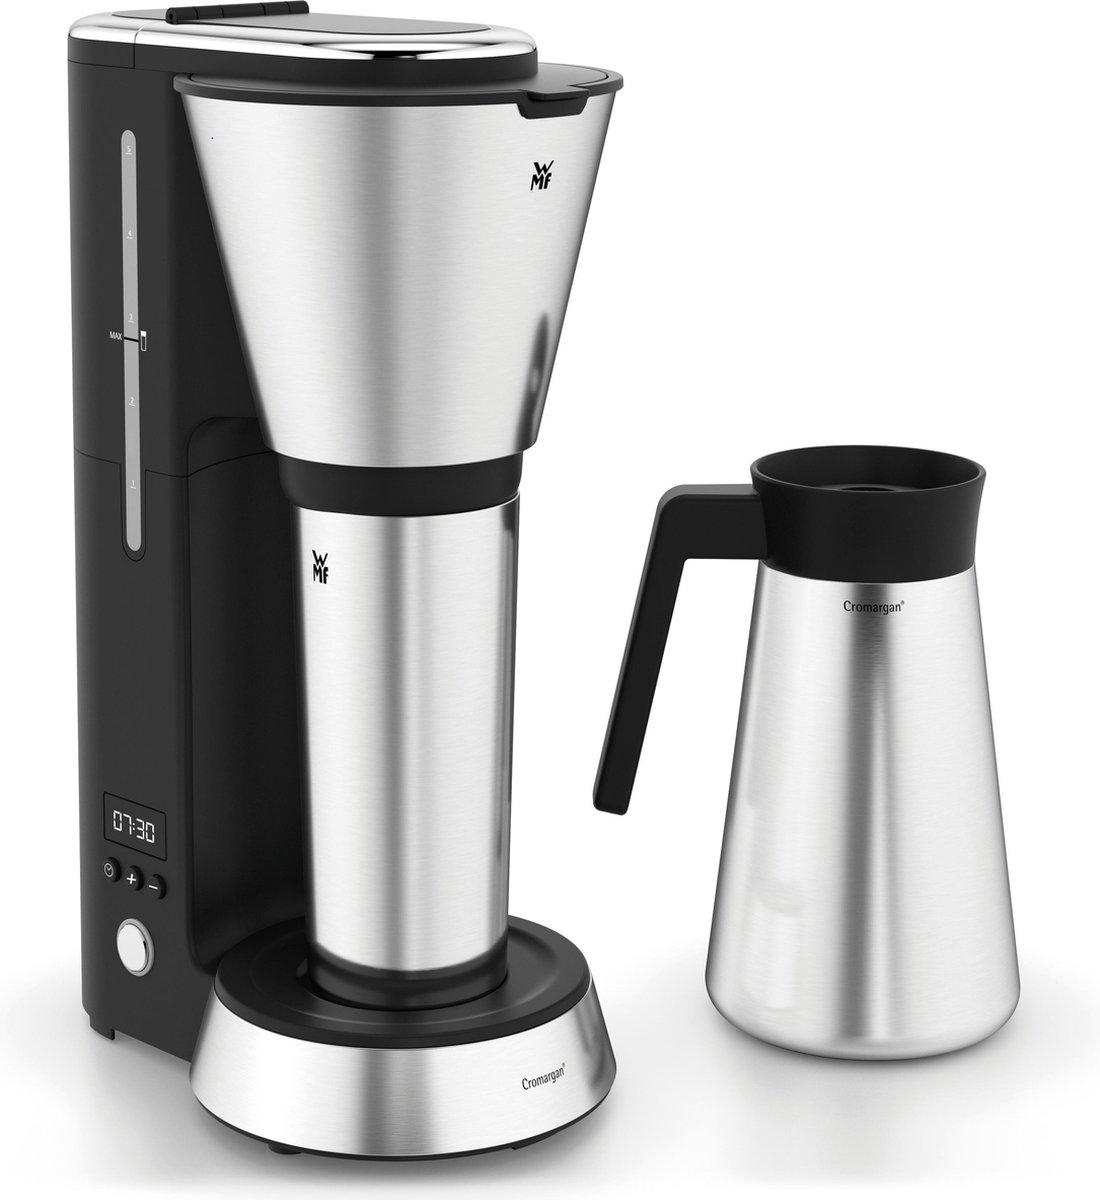 WMF K?CHENminis Aroma Thermo to go Koffiezetapparaat Zwart, Zilver Capaciteit koppen: 5